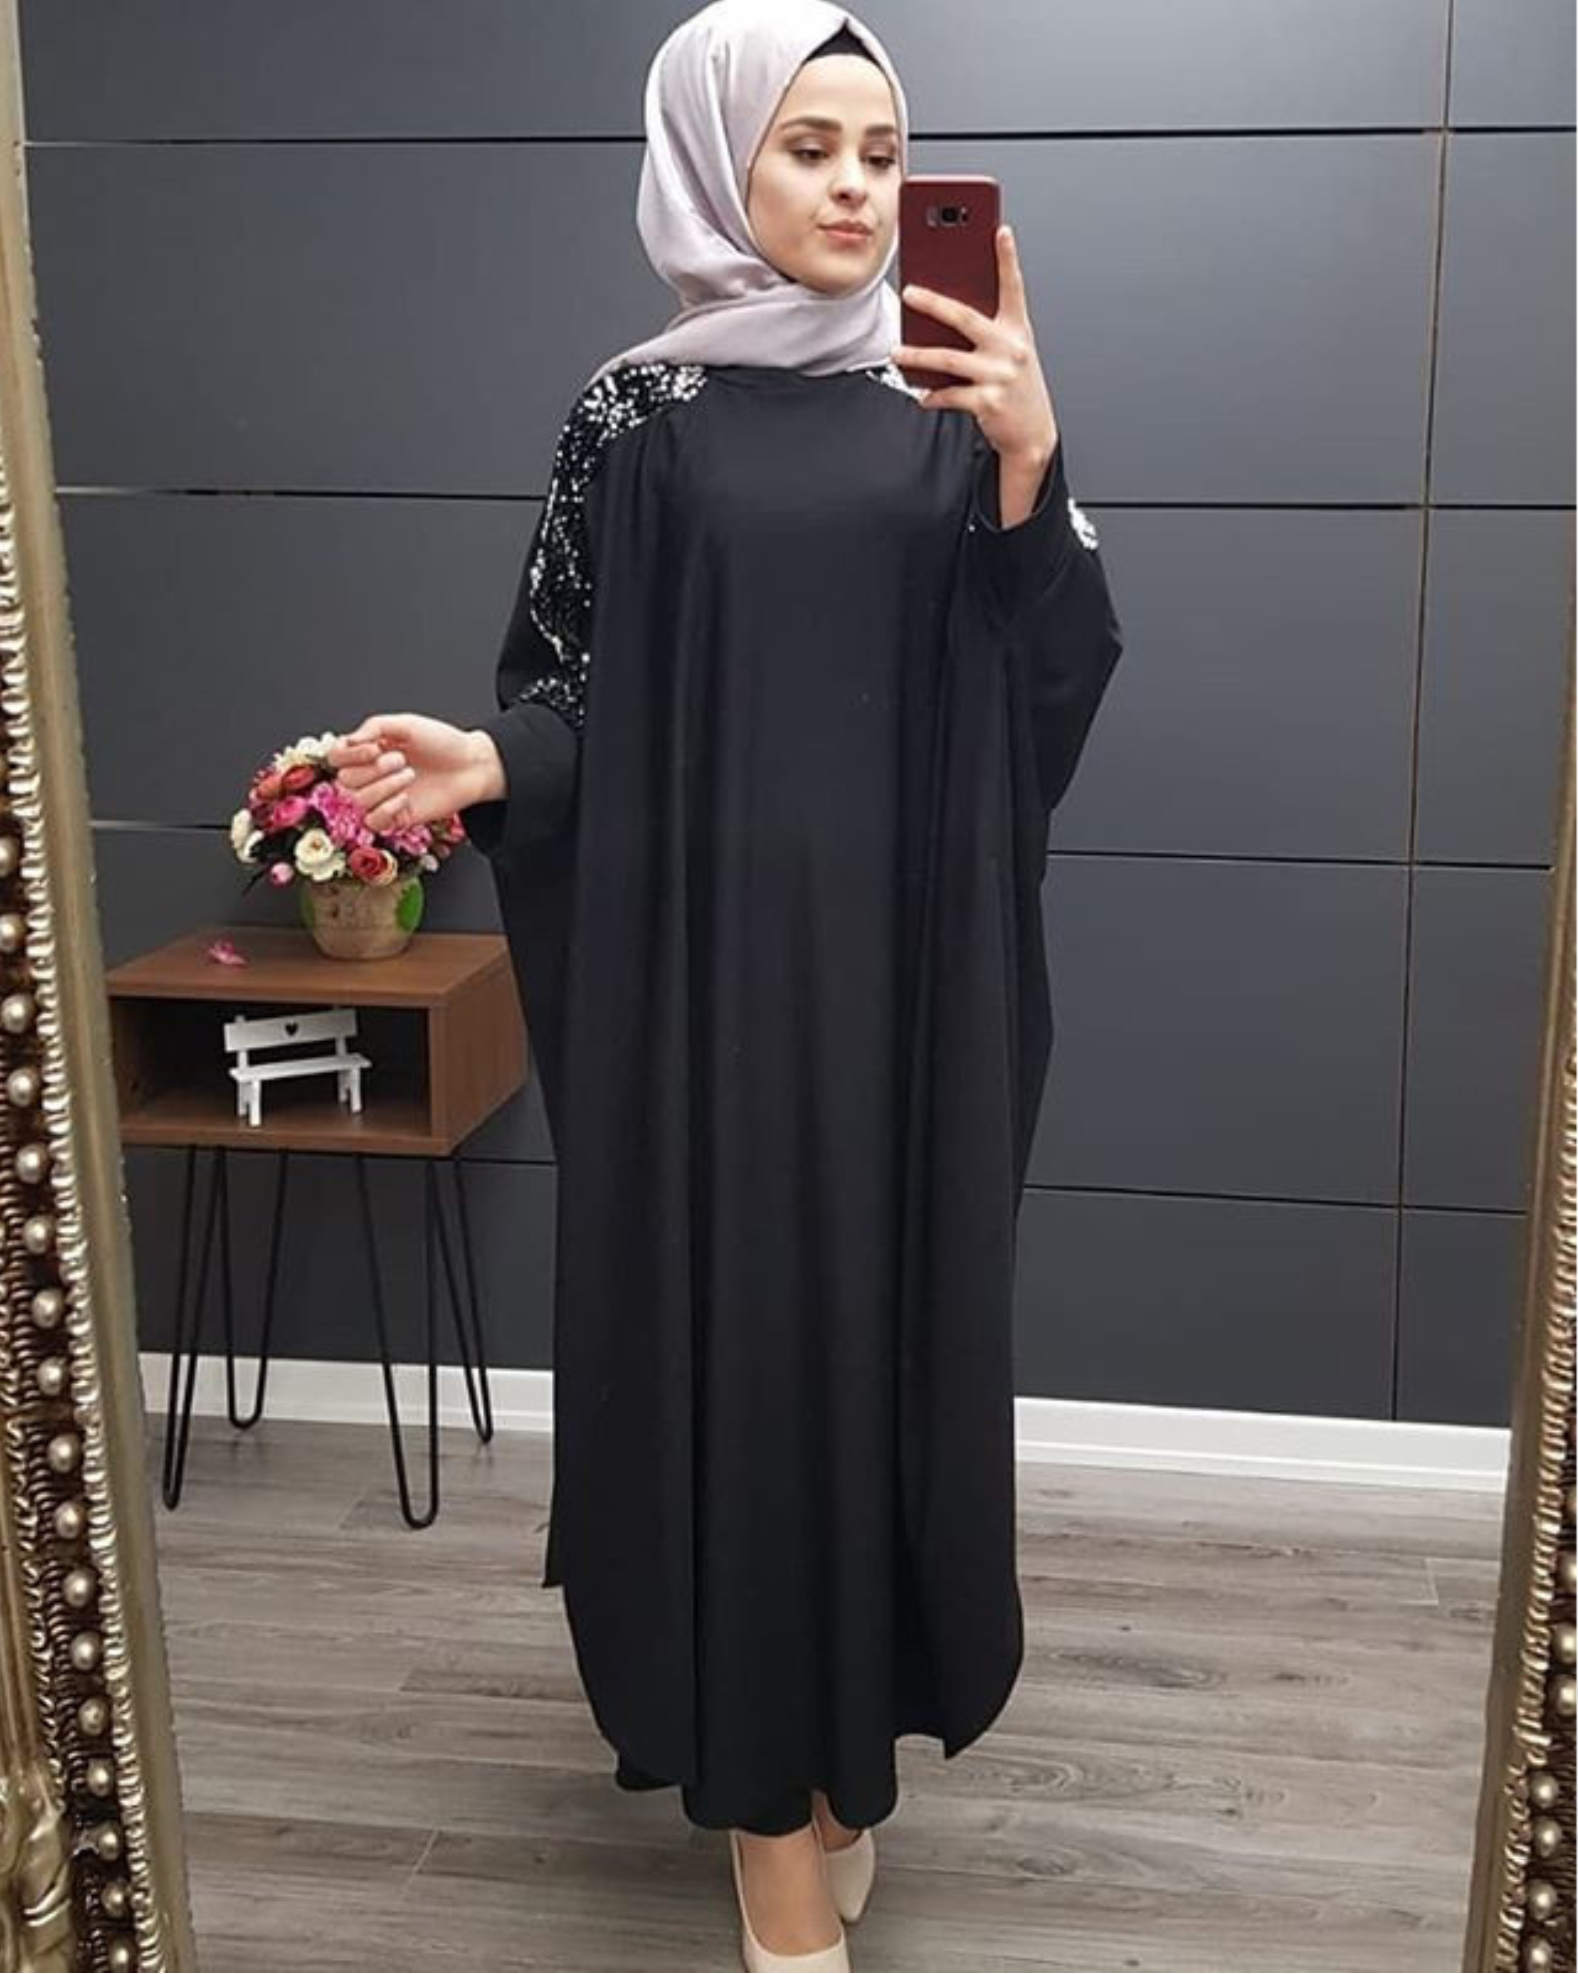 Plus Size Islamic Clothing Muslim Dress Women Dubai Turkish Long Robe Kimono Sequin Ethnic Style Seven